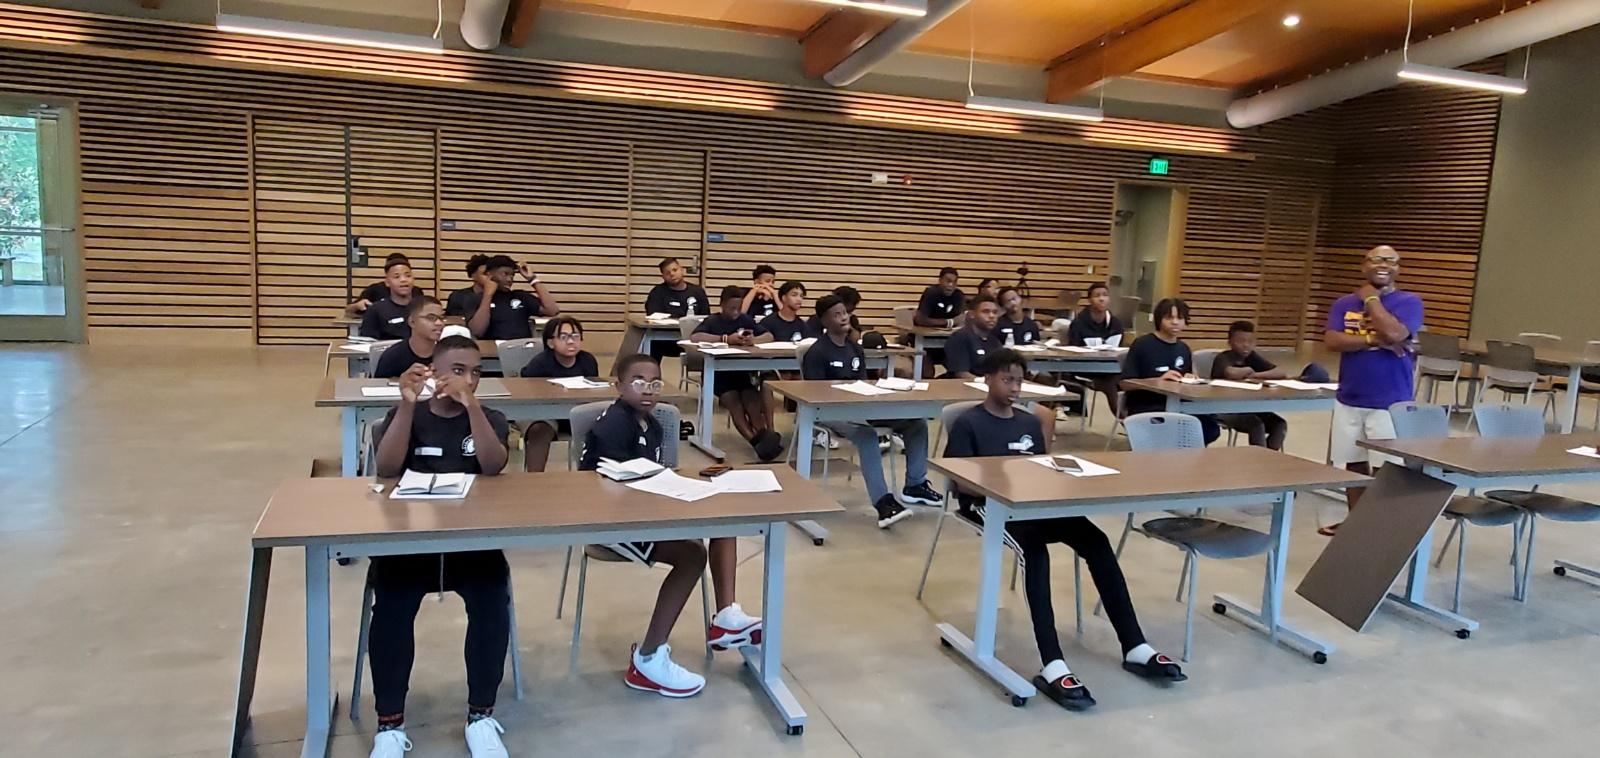 2021 Boys Leadership Institute - The Maynard 4 Foundation 02